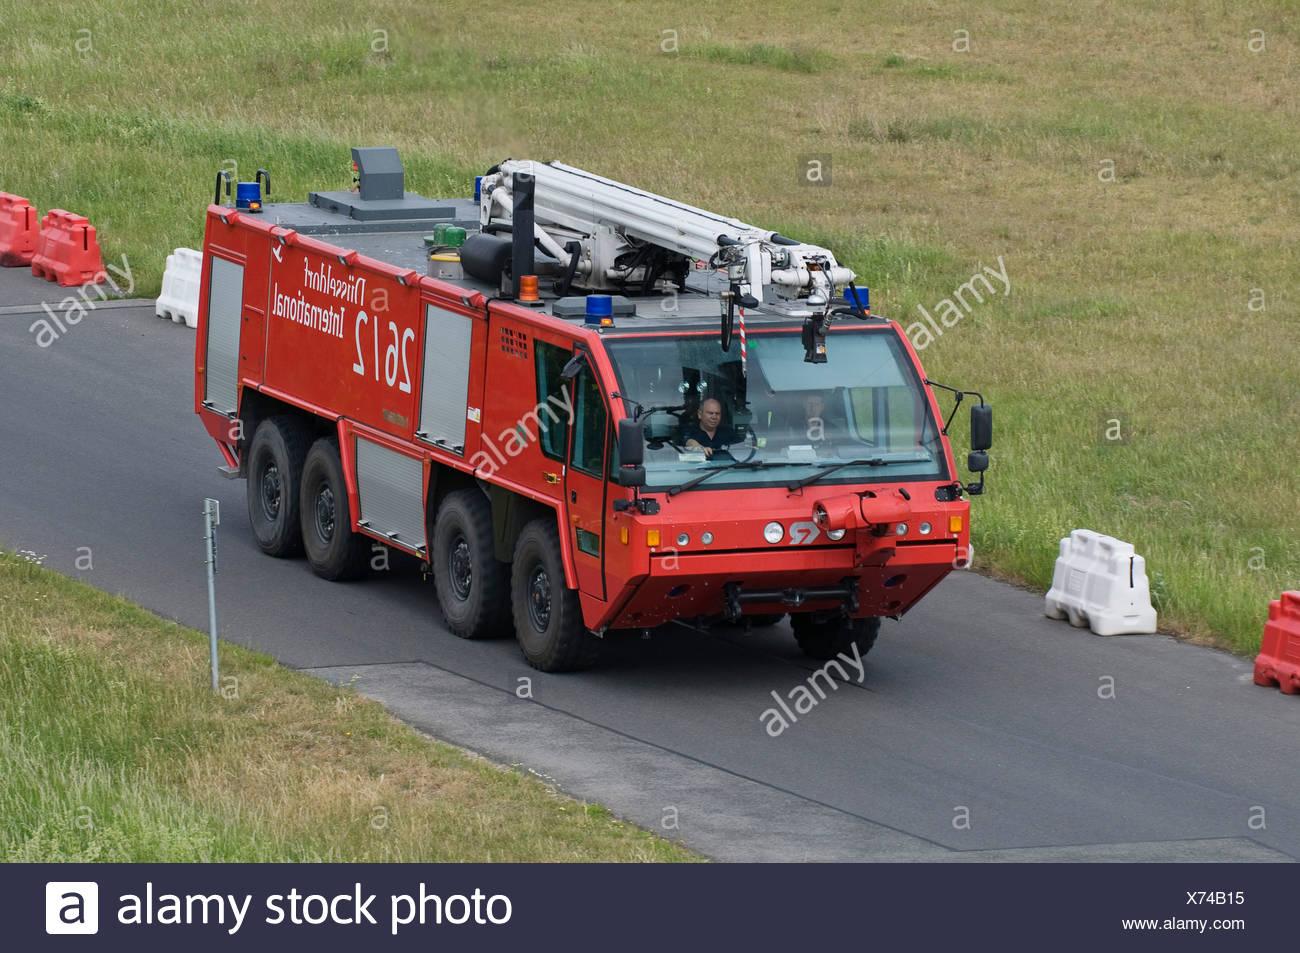 Emergency vehicle of the fire brigade, Duesseldorf International Airport, Duesseldorf, North Rhine-Westphalia, Germany, Europe - Stock Image